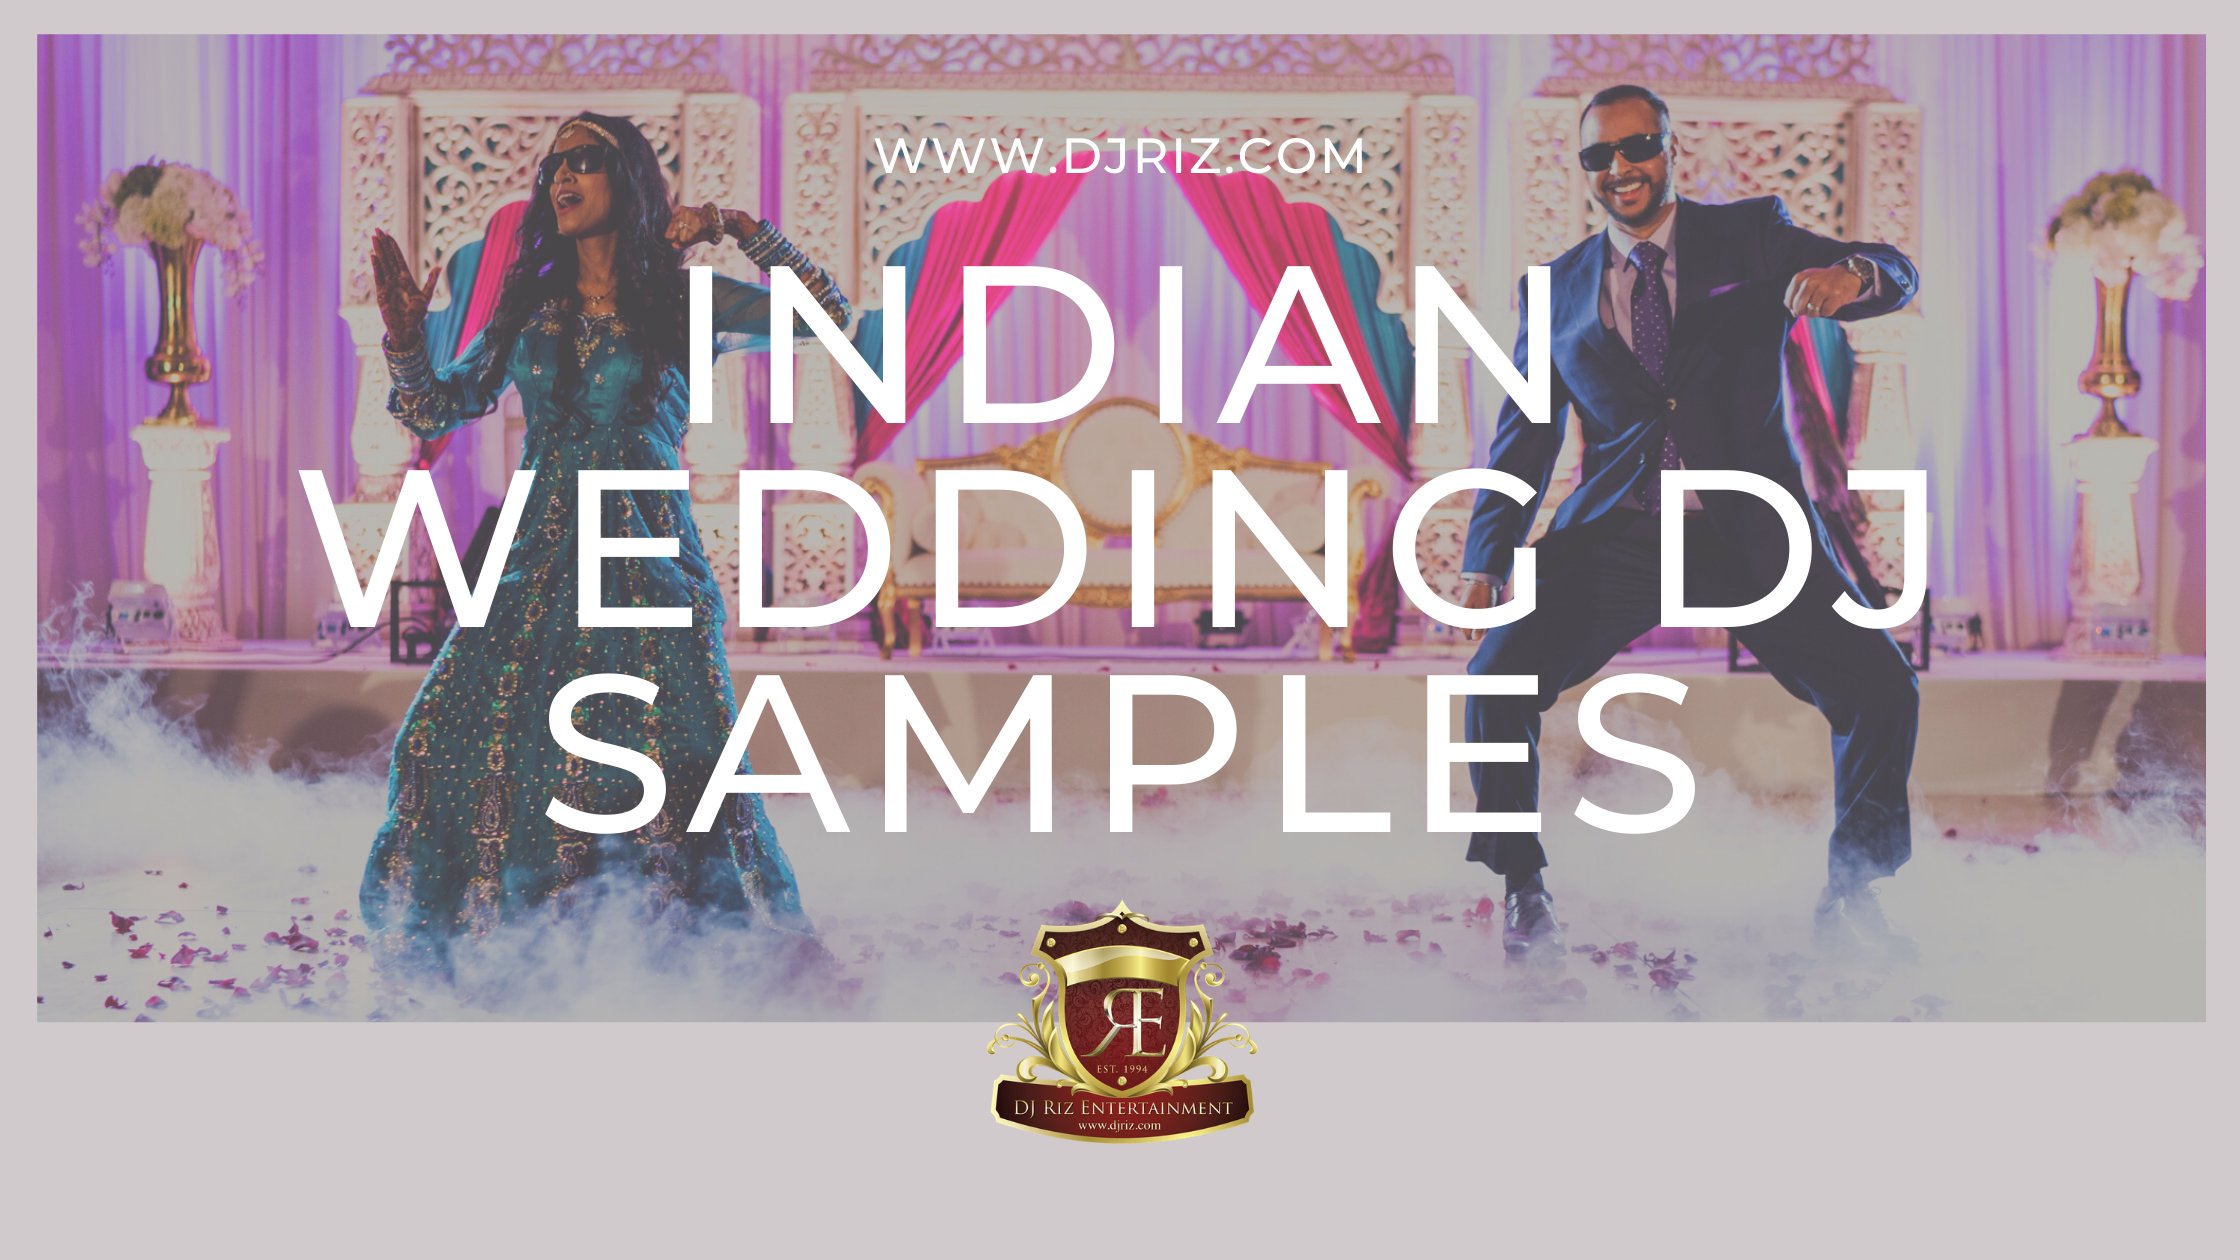 Indian Wedding DJ Samples